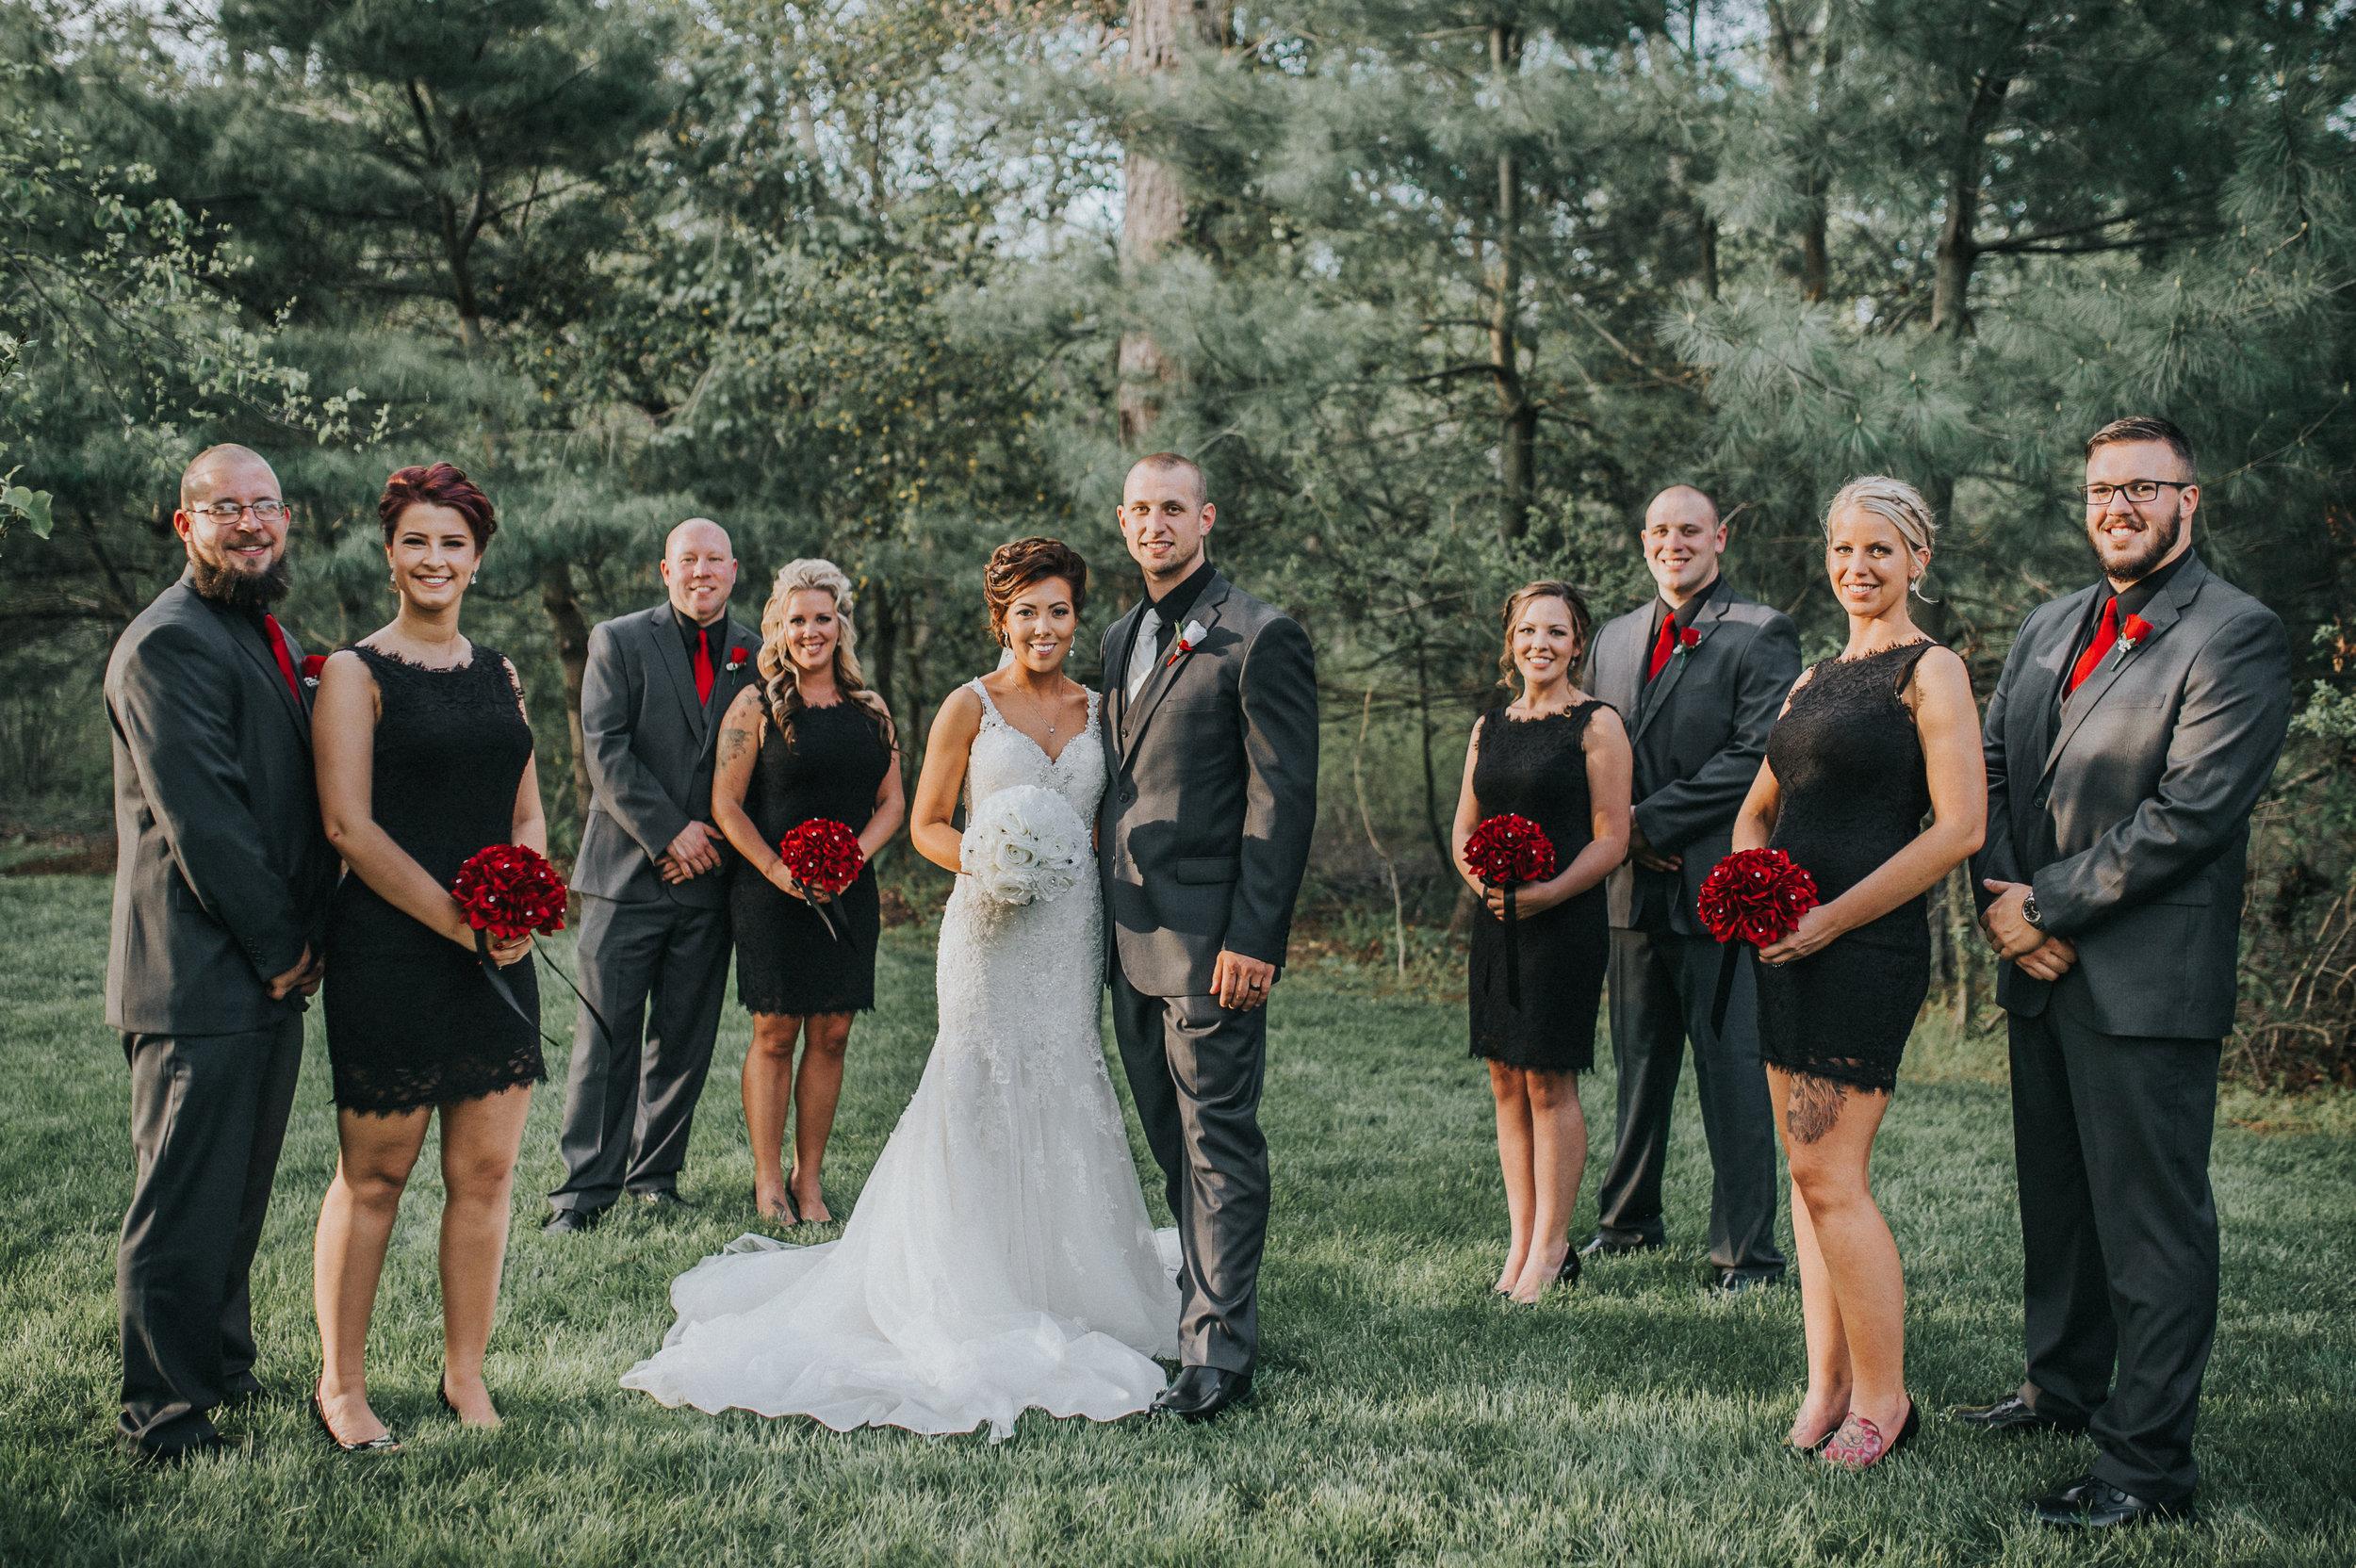 Christina-and-Gene-Wedding-Marla-Rain-Photography-446.jpg